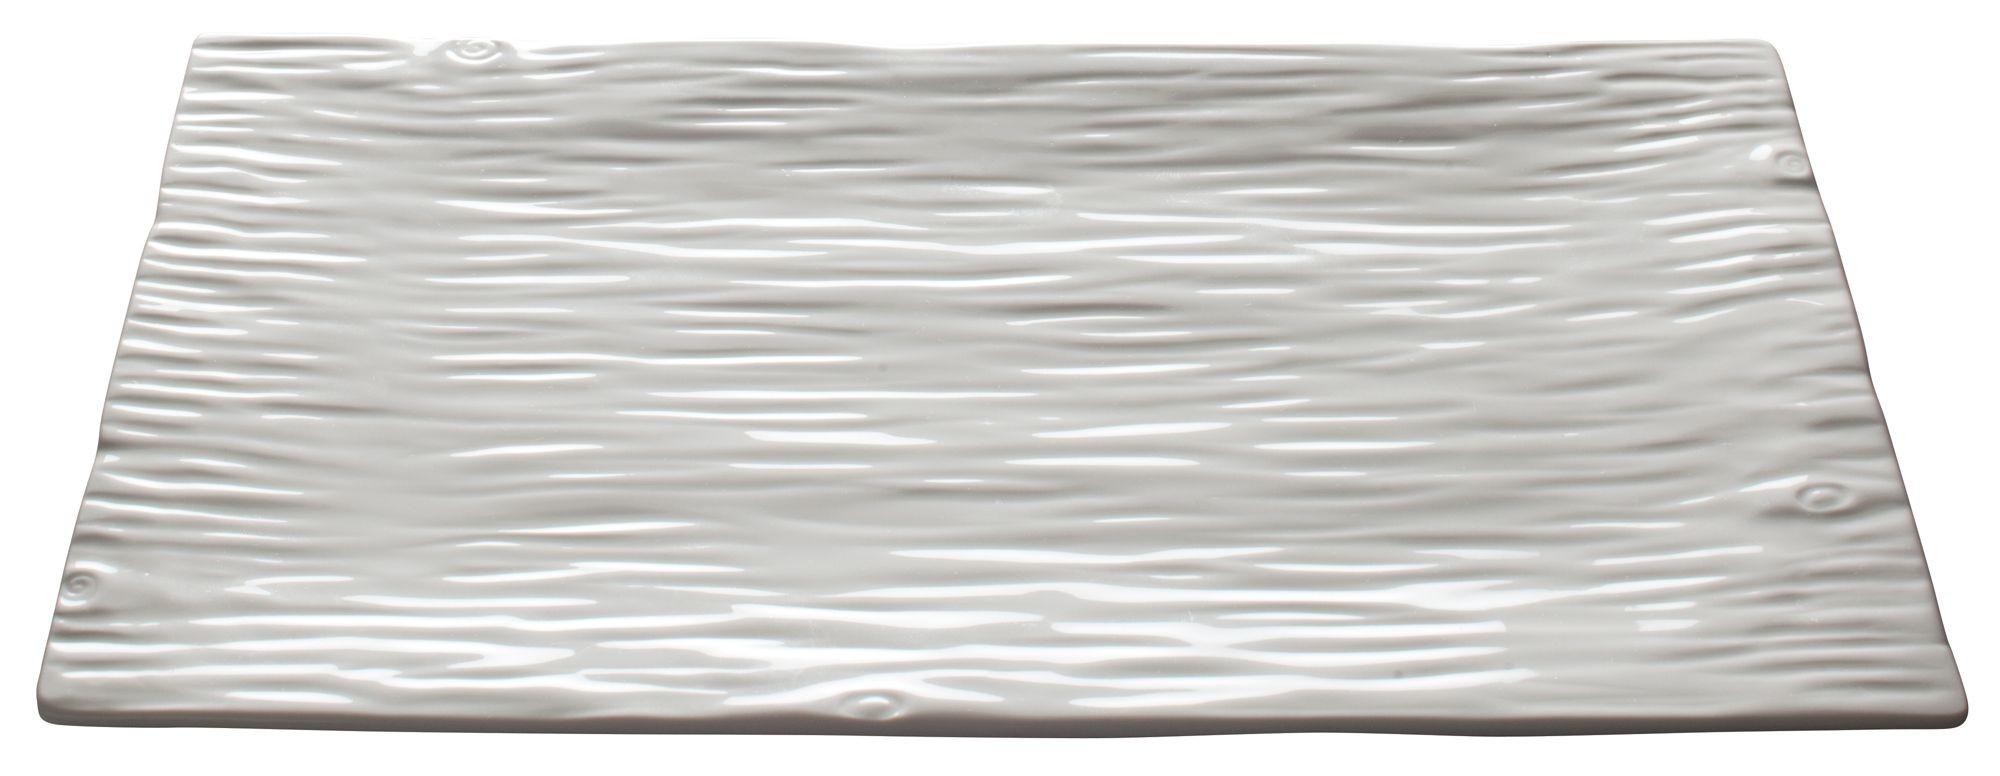 "Winco WDP002-203 Dalmata Creamy White Porcelain Rectangular Platter 16-1/4"" x 9-1/2"""